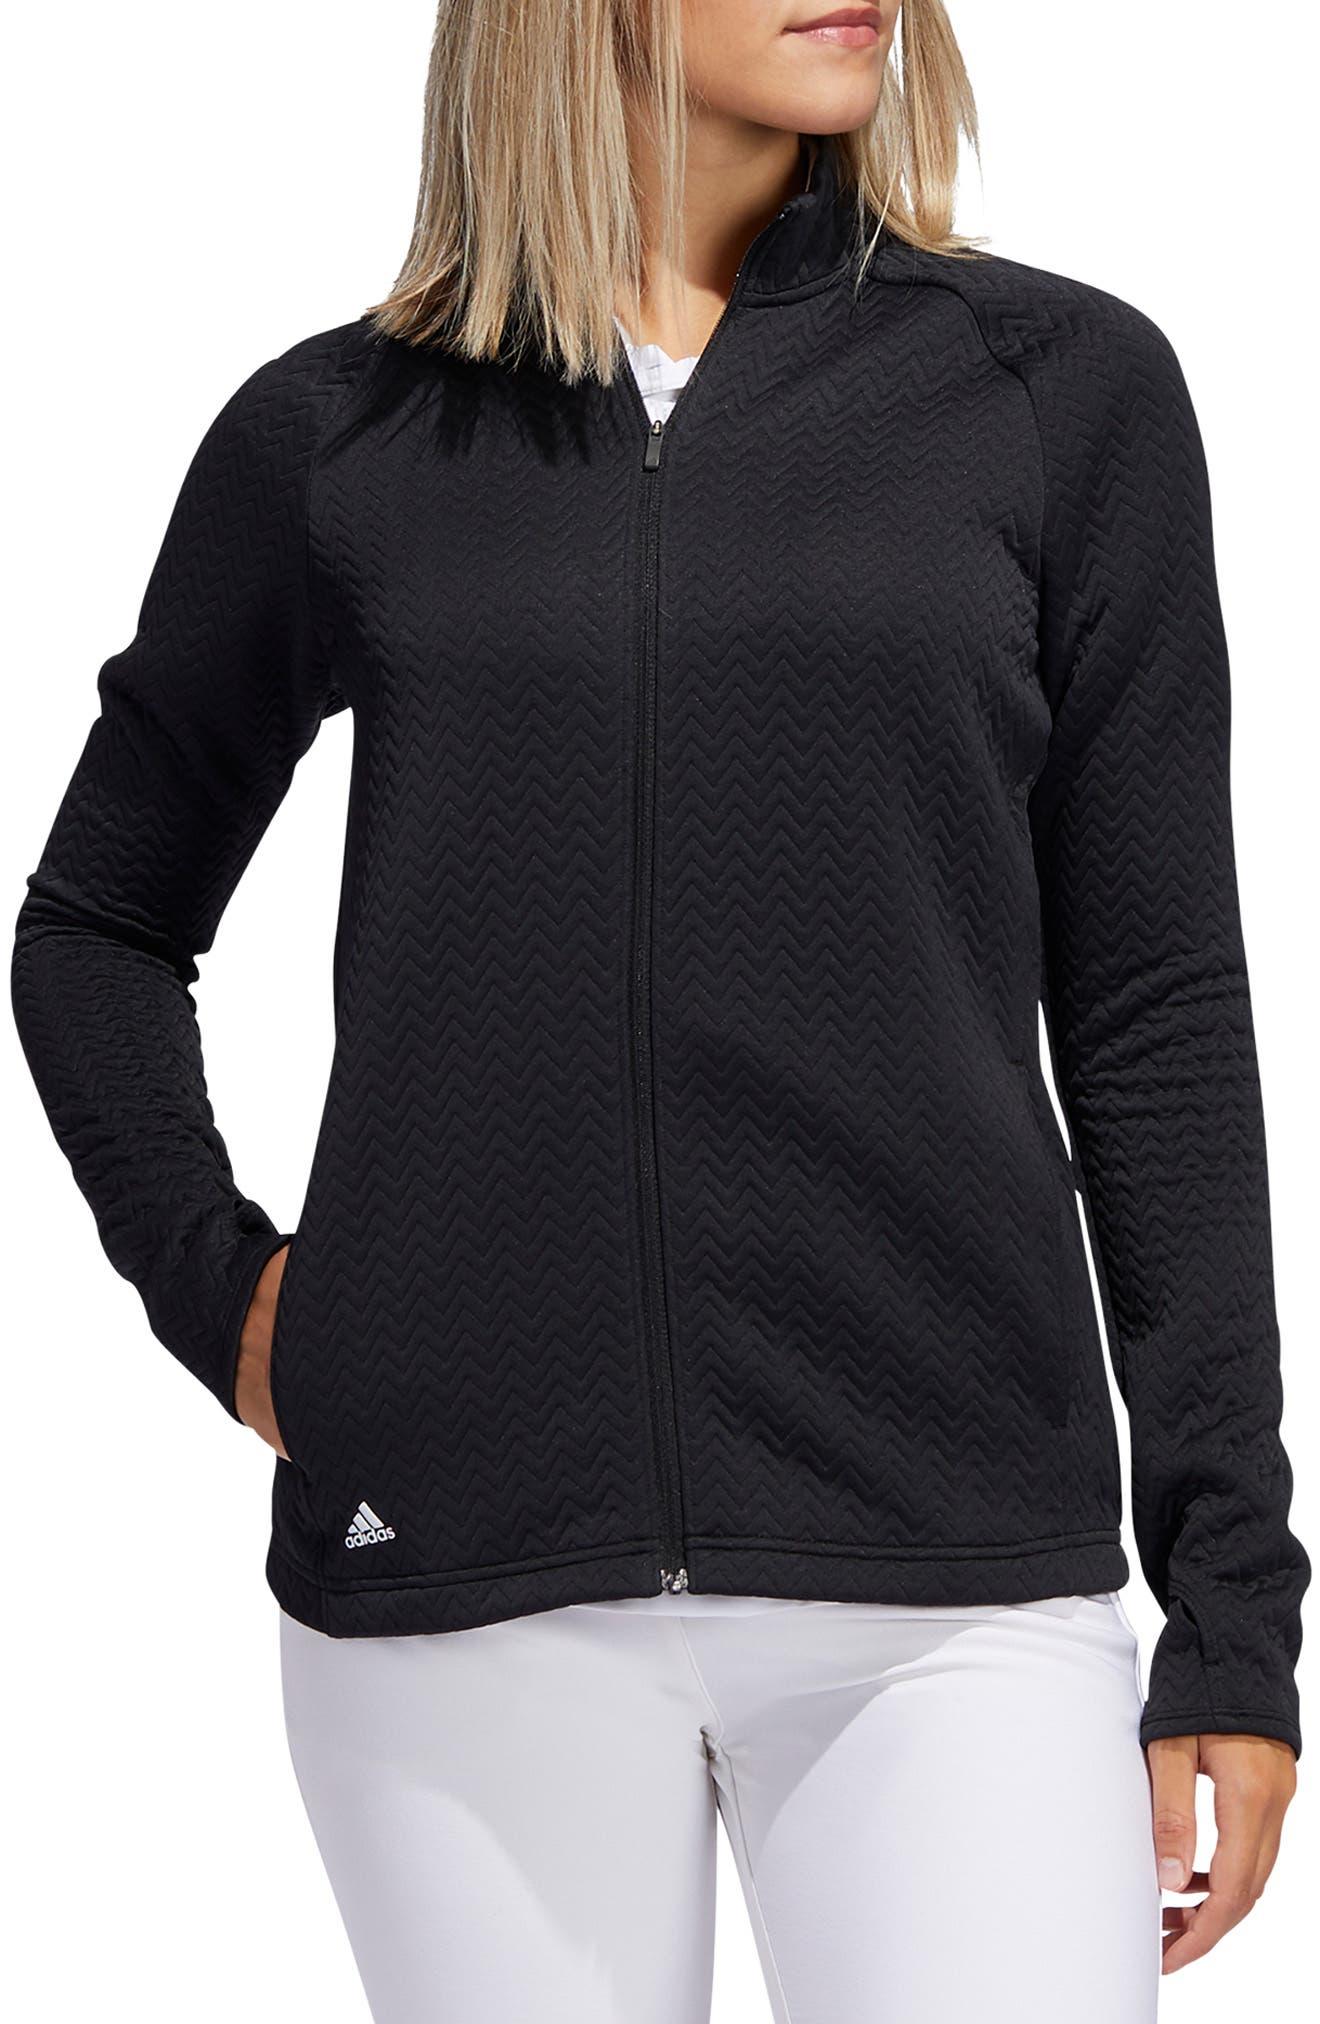 Texture Layer Jacket